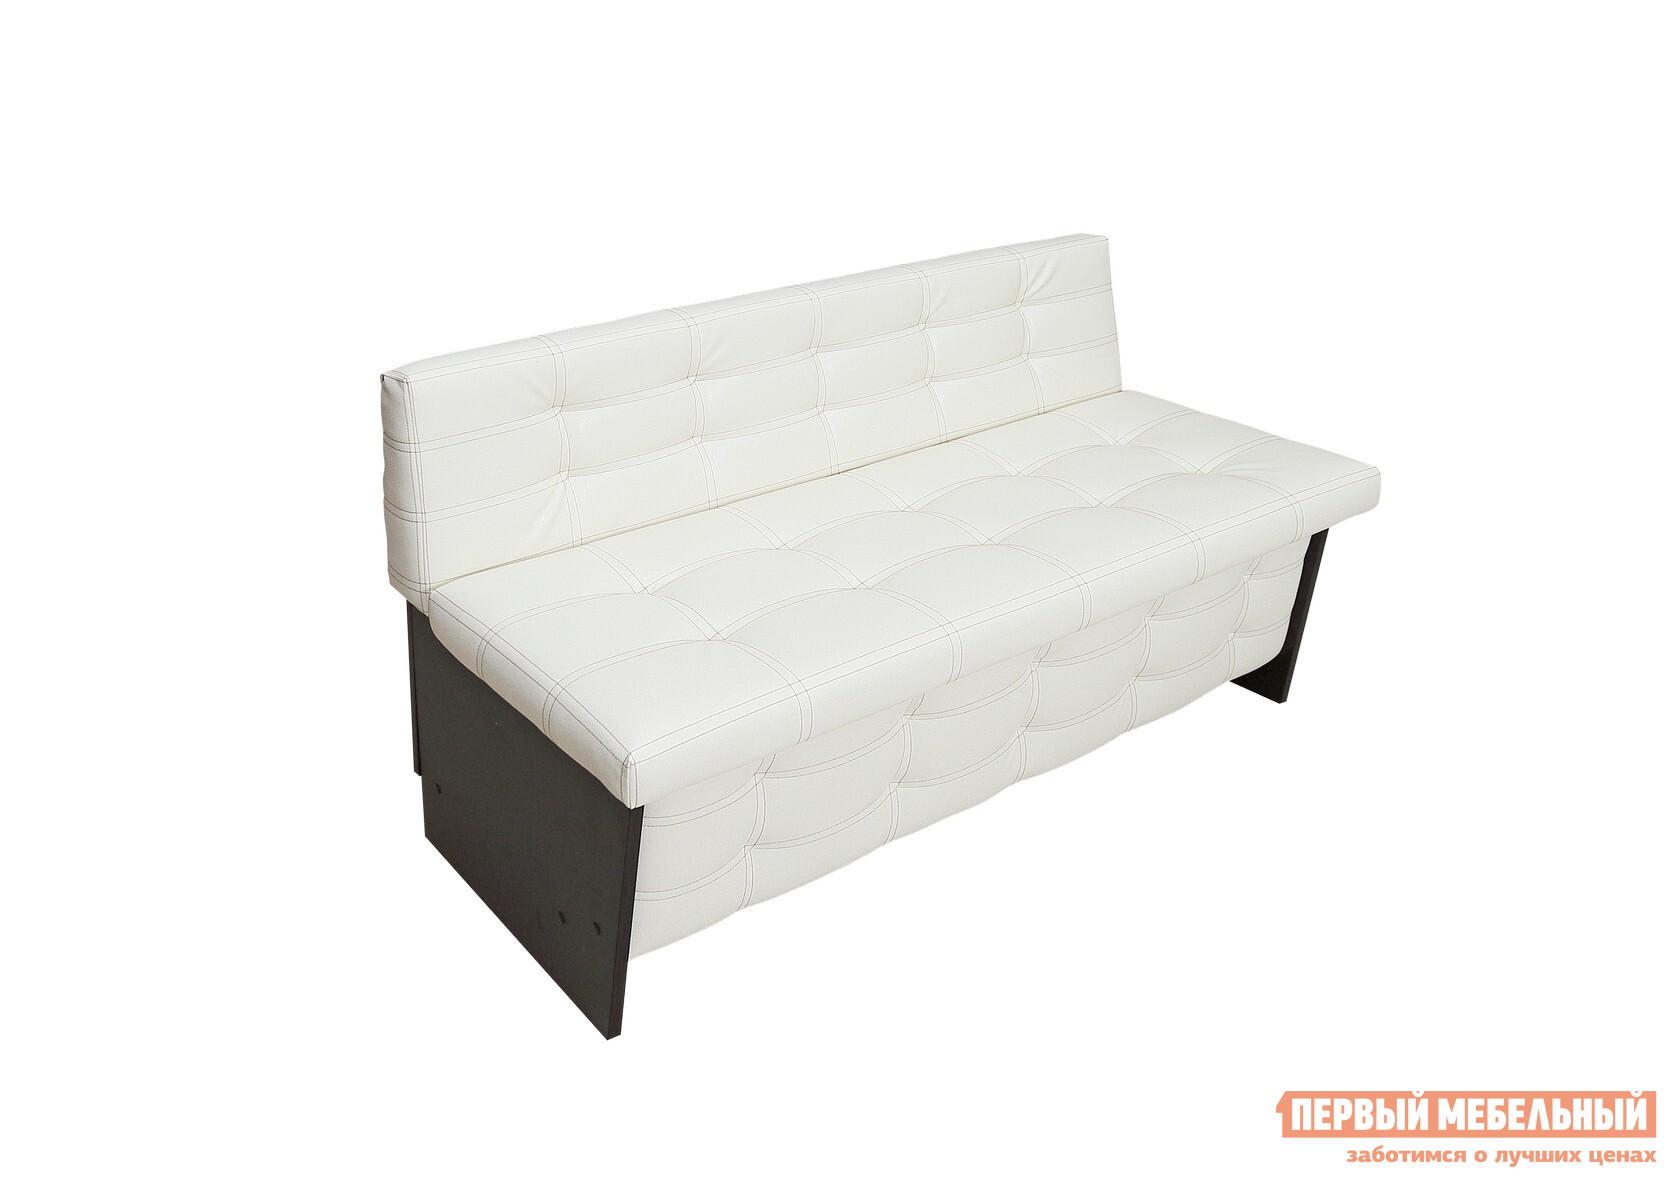 Кухонный диван ТД Арника Милан 1200 кухонный диван тд арника милан 1200